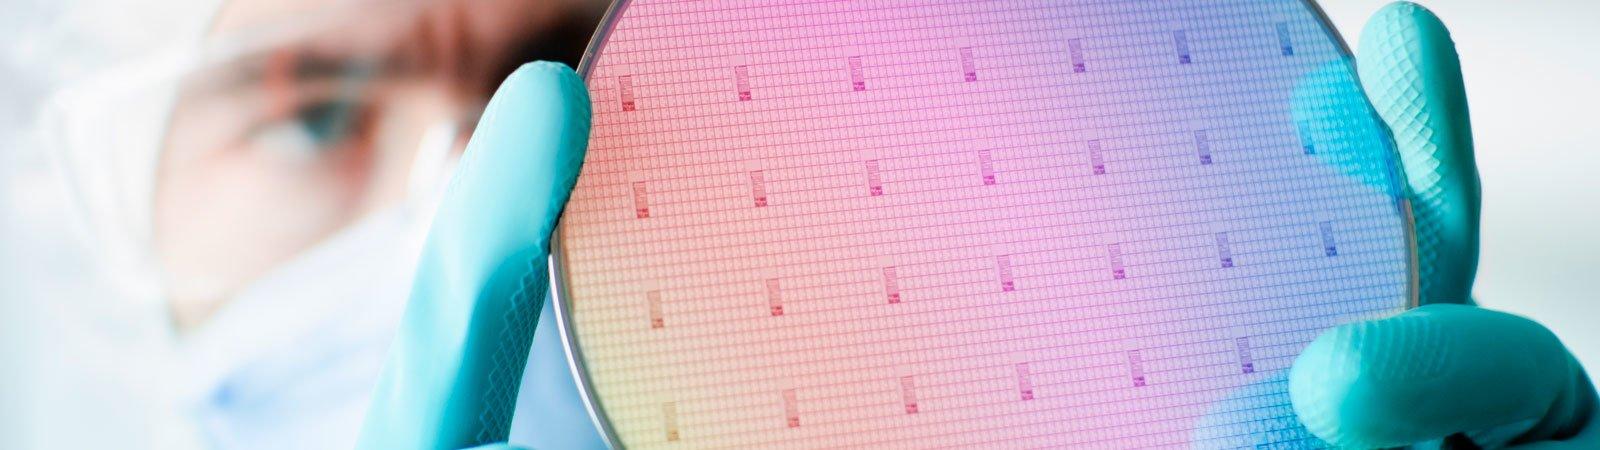 Electronics Wafer Electronics Industry Testing